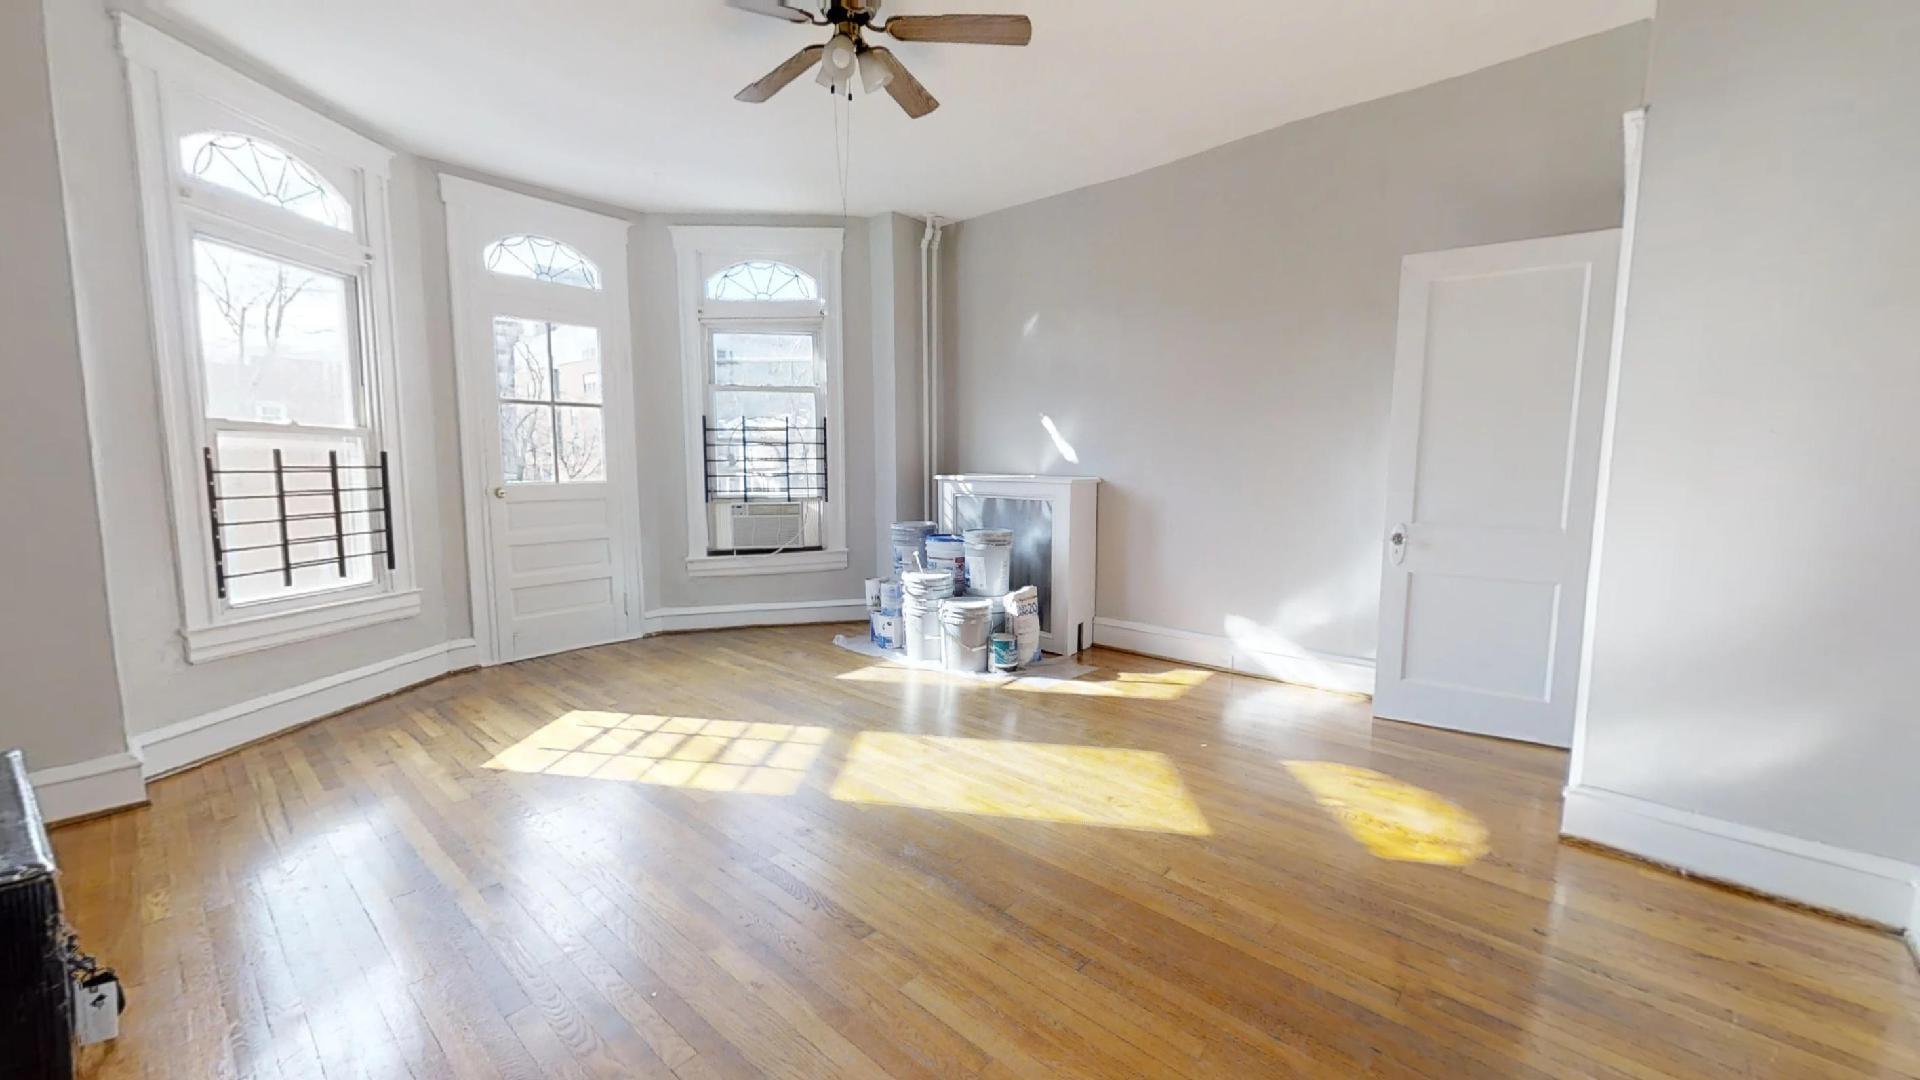 3133 N Calvert St ~ 1 Bedroom Apartment / Huge Living Room / Backyard